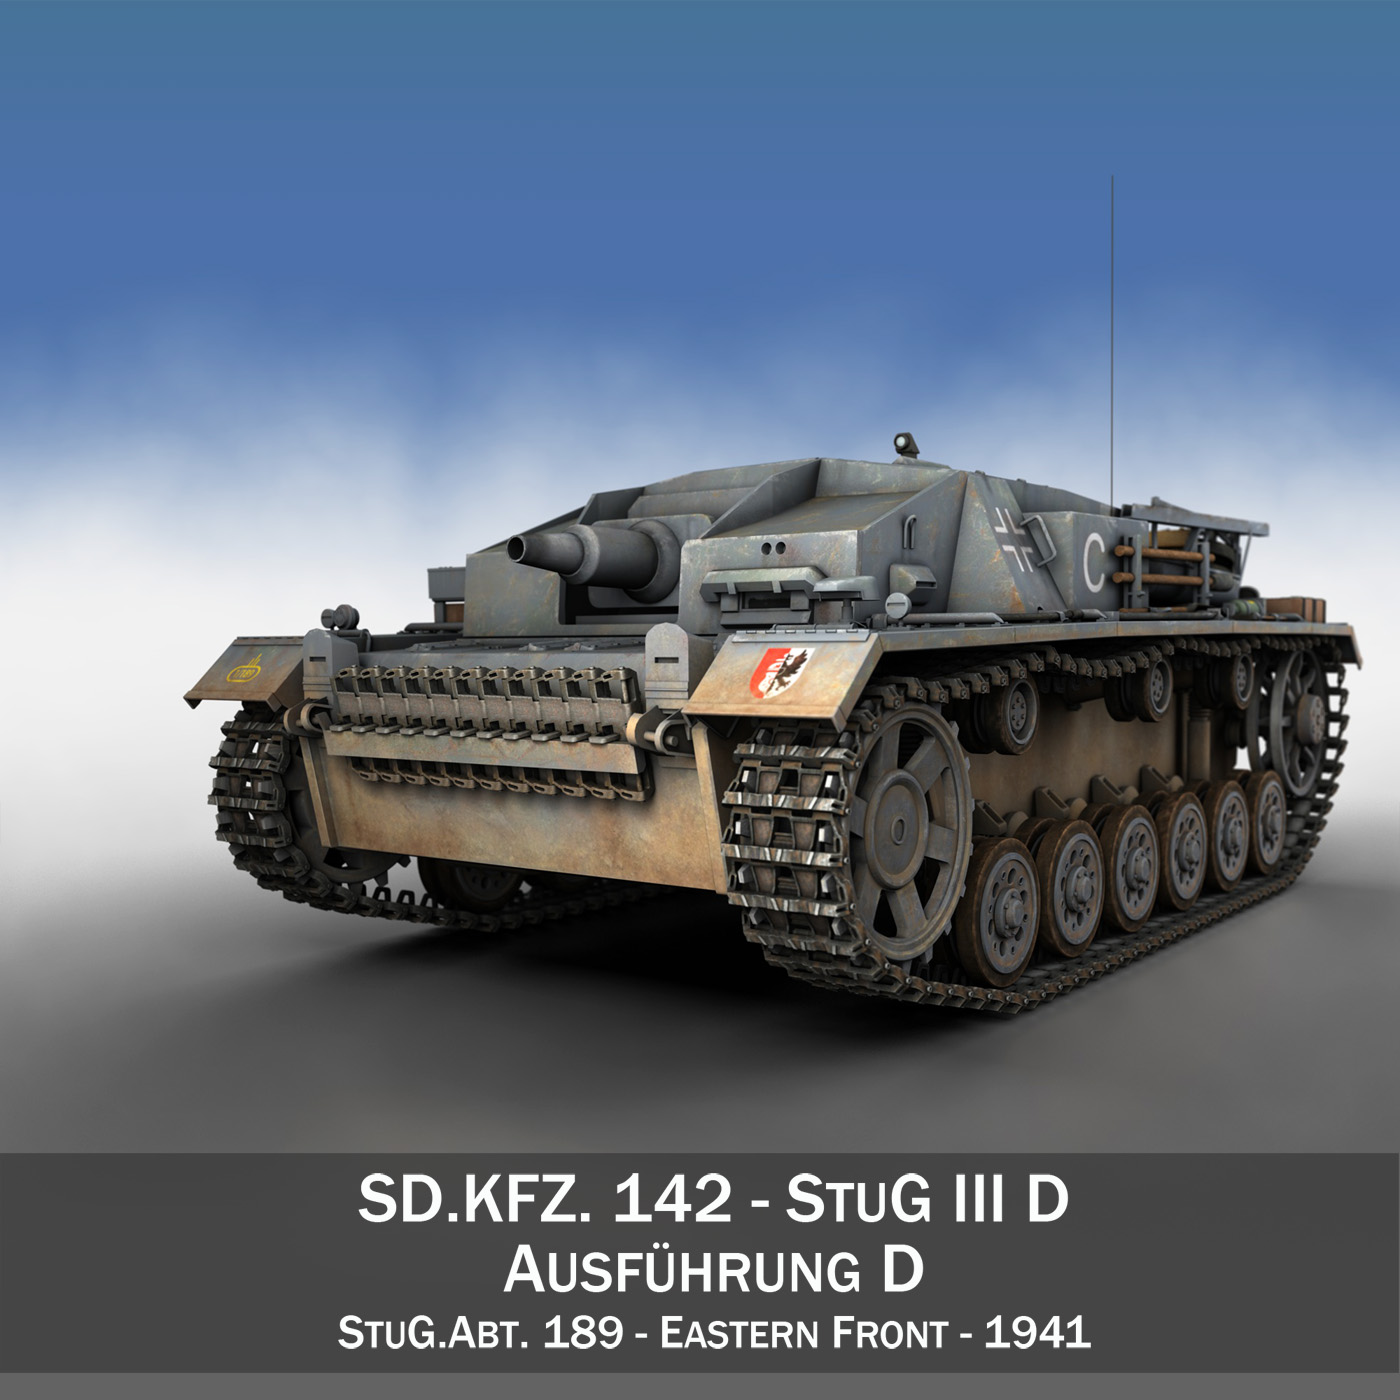 stug iii - ausf.d - stug.abt. 189 3d modelis 3ds fbx lwo lws lws obj c4d 265184